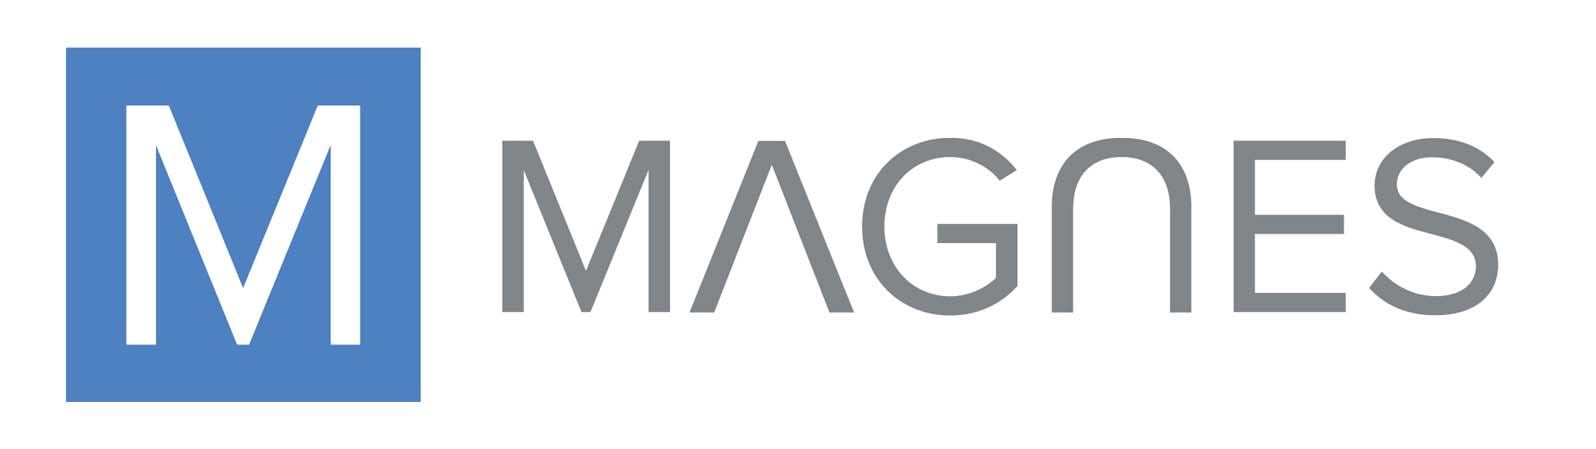 Magnes logo.jpg